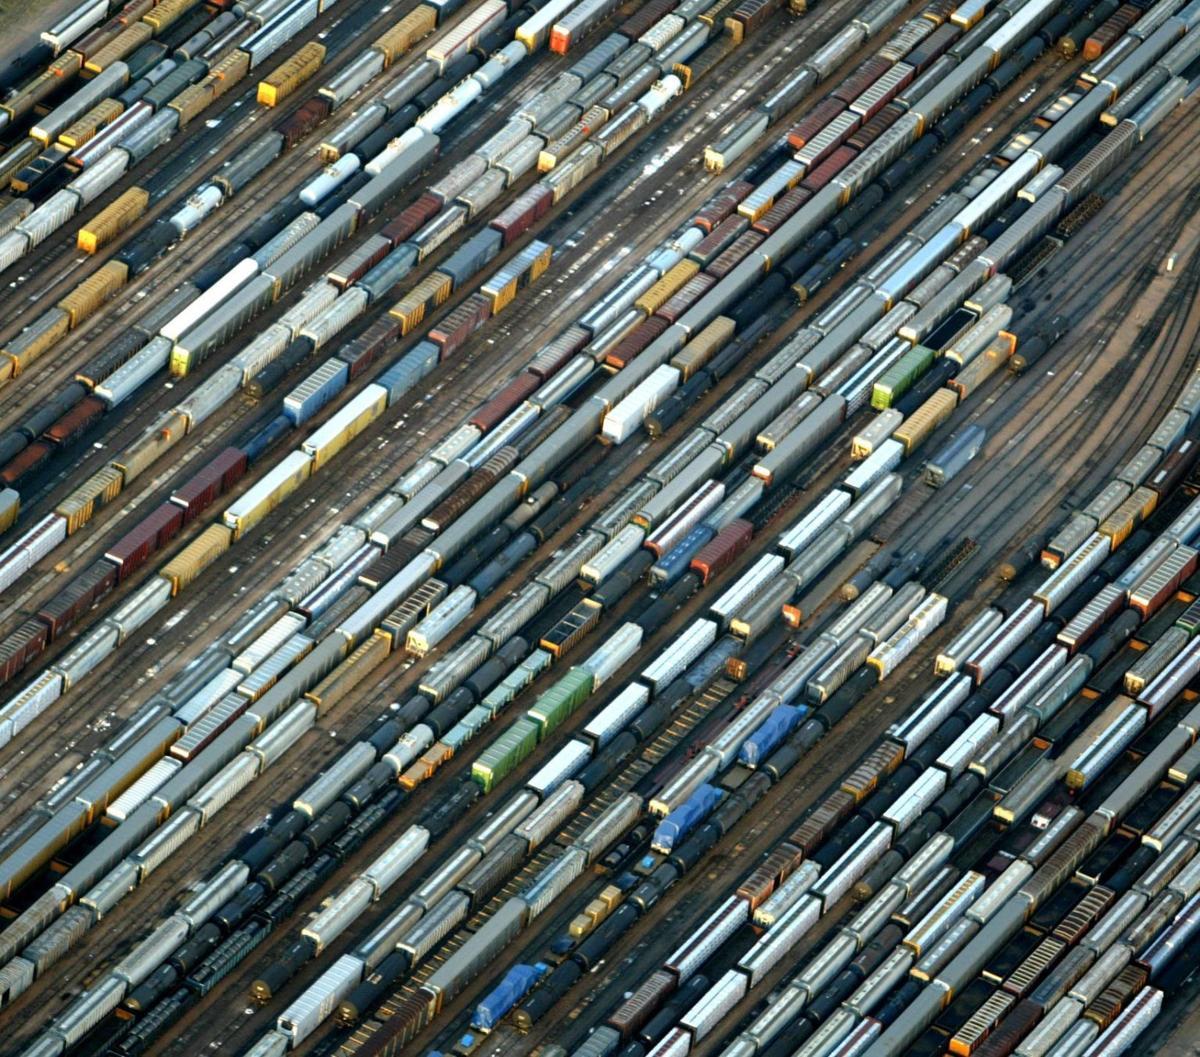 Union Pacific, BNSF paying bigger hiring bonuses amid labor